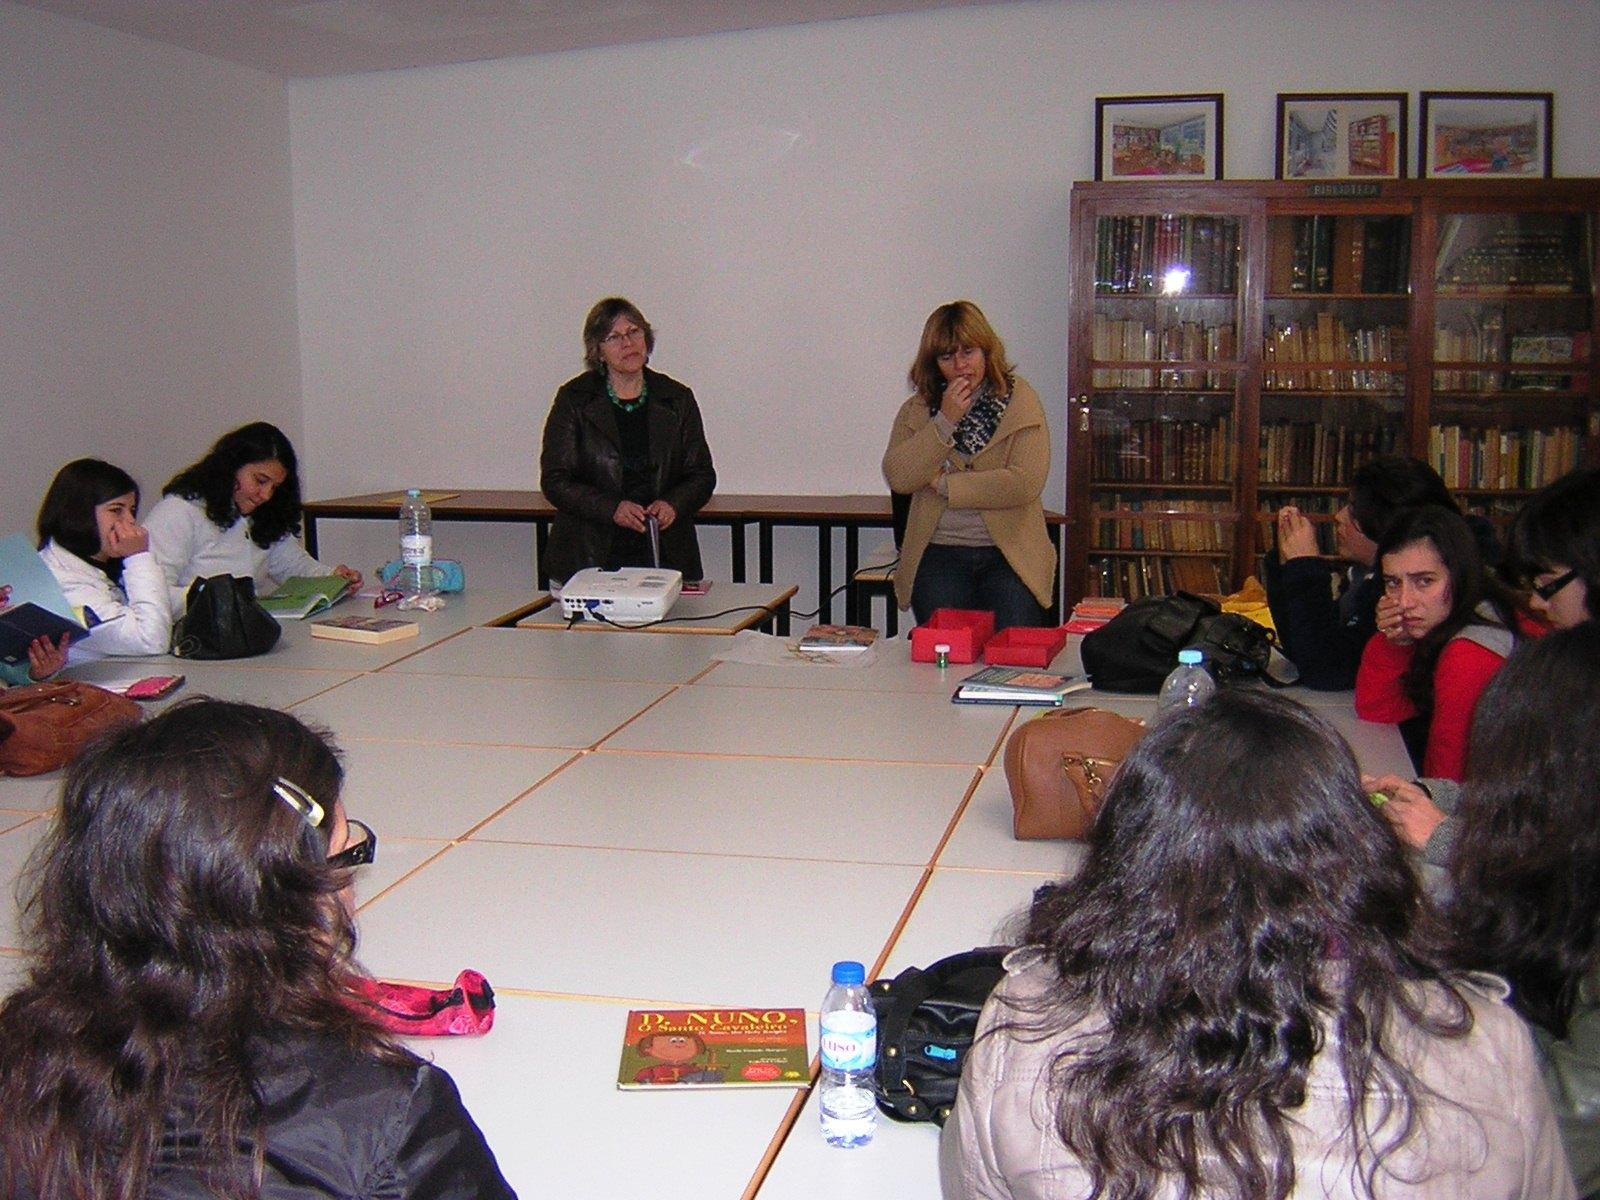 workshop sobre narrativa para crianças - Vanda Furtado 3 jan. 13 002